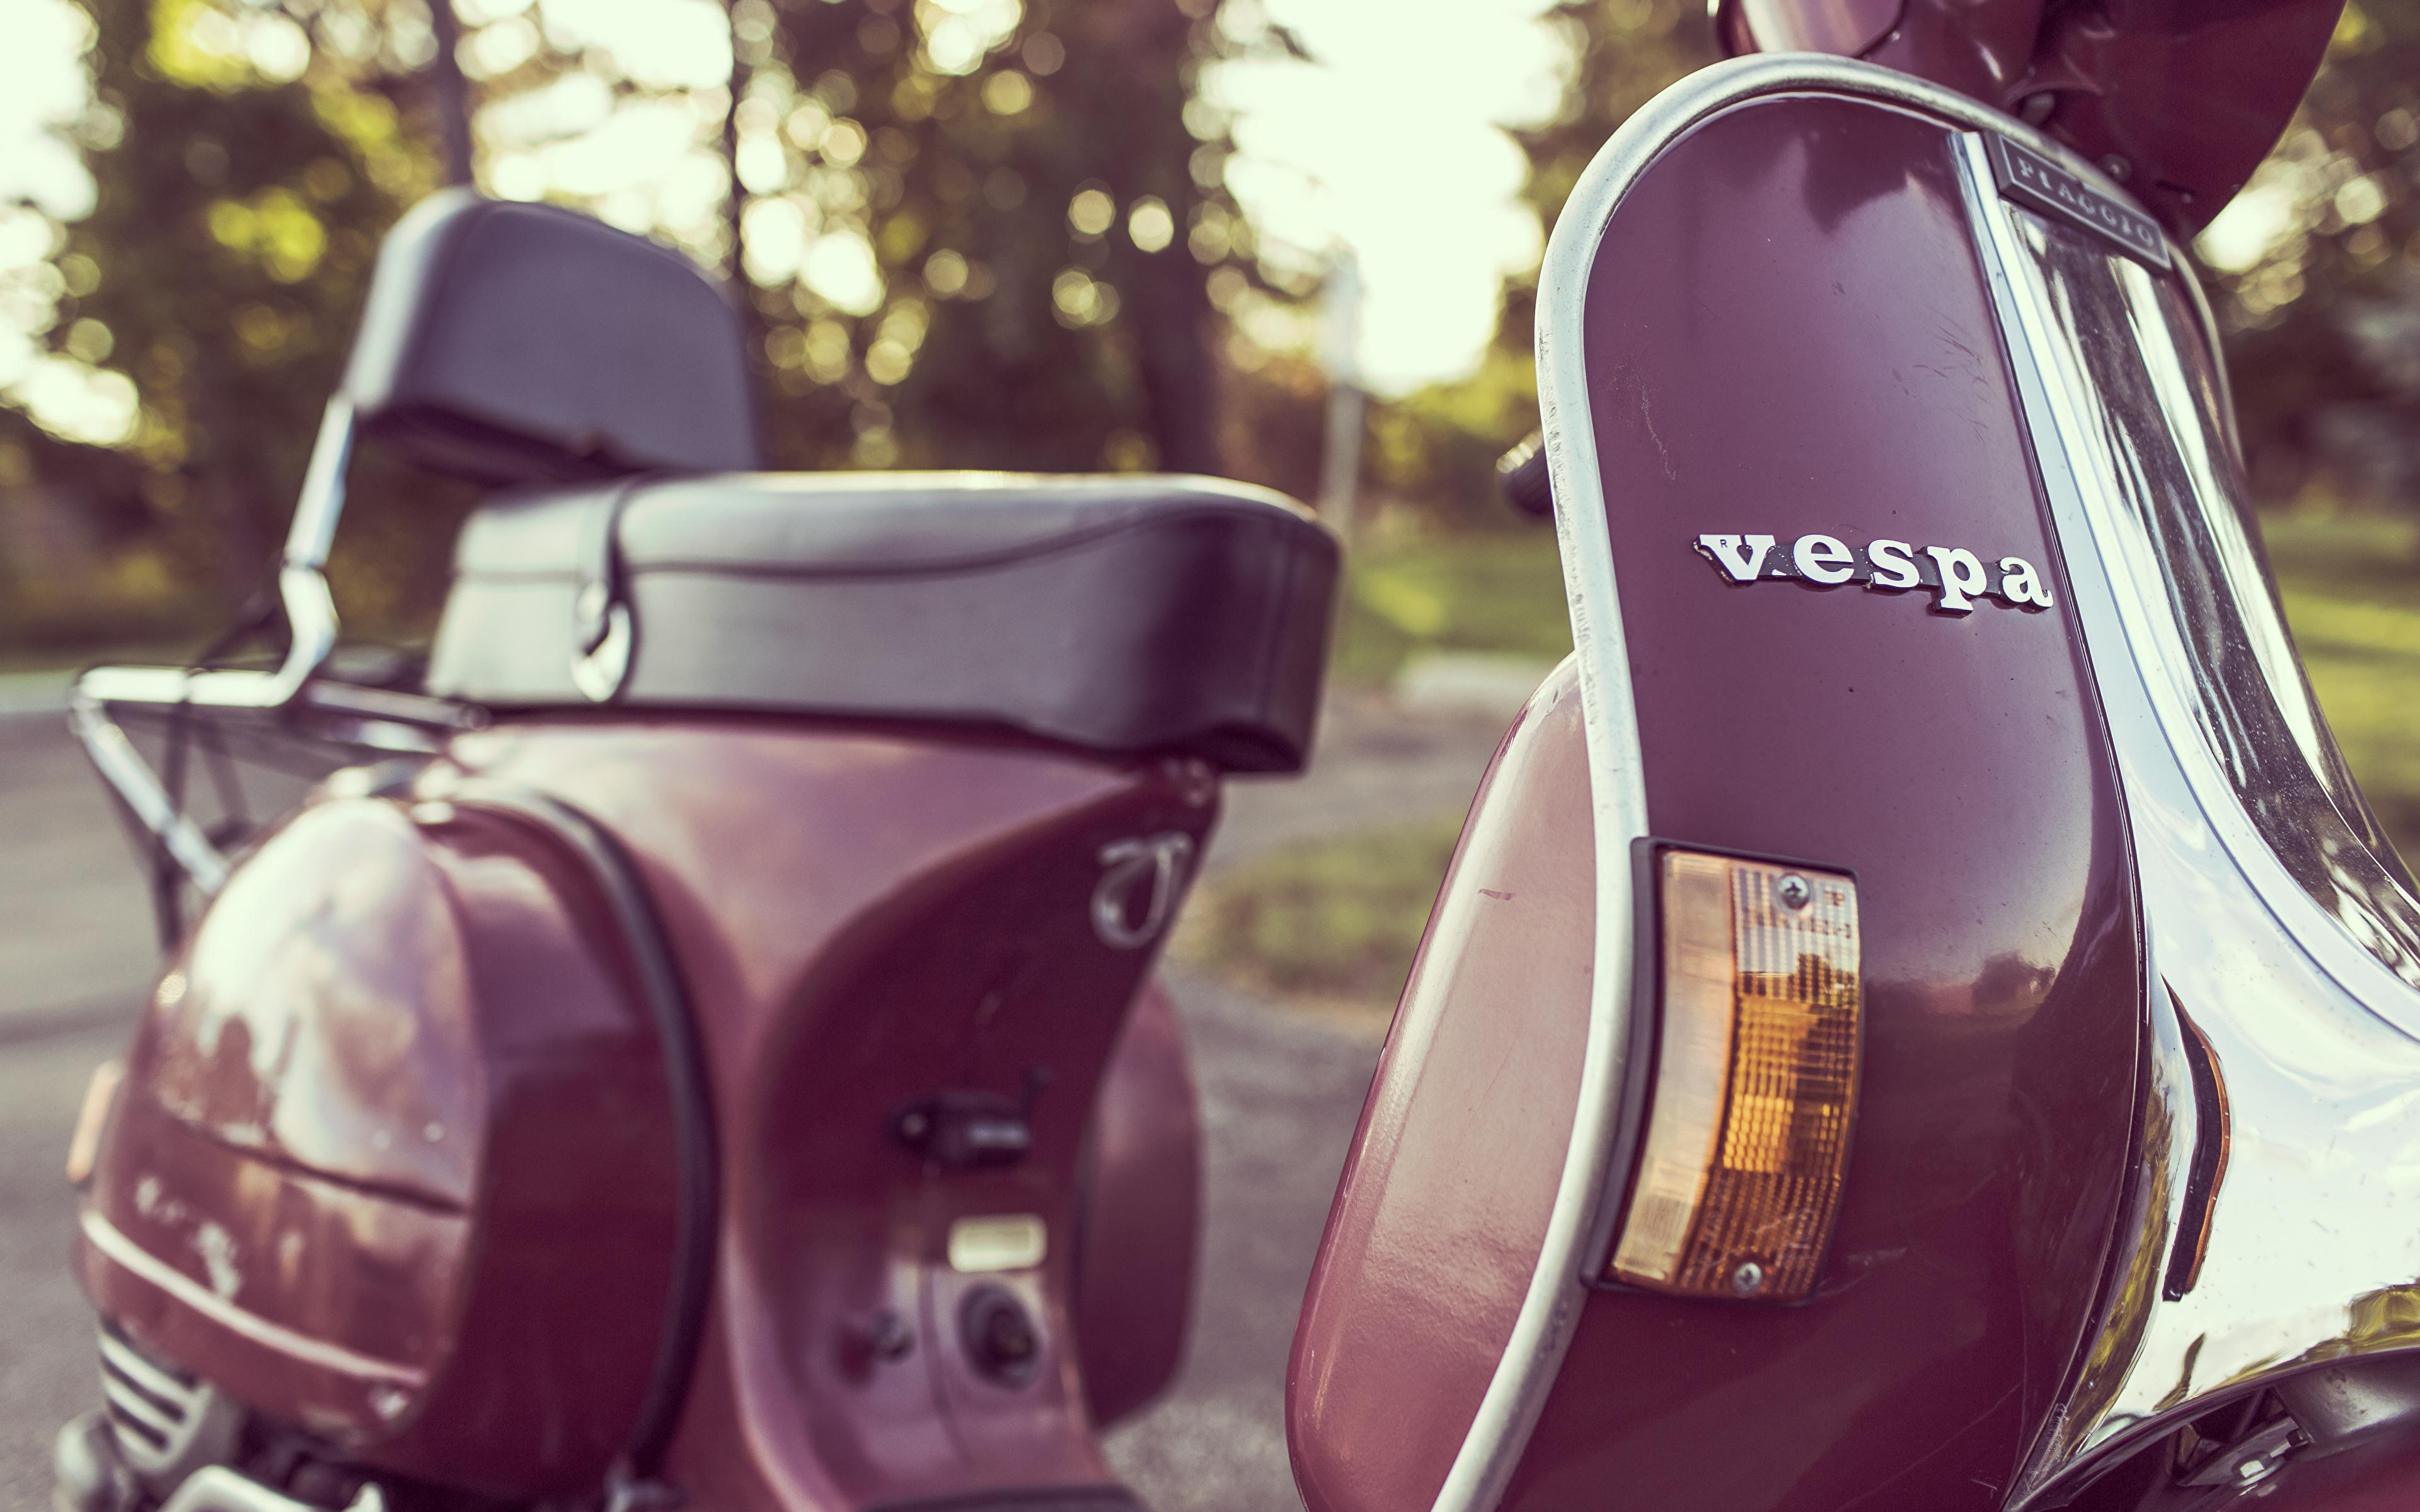 Desktop Wallpapers Vespa Antique Motorcycles Closeup 3840x2400